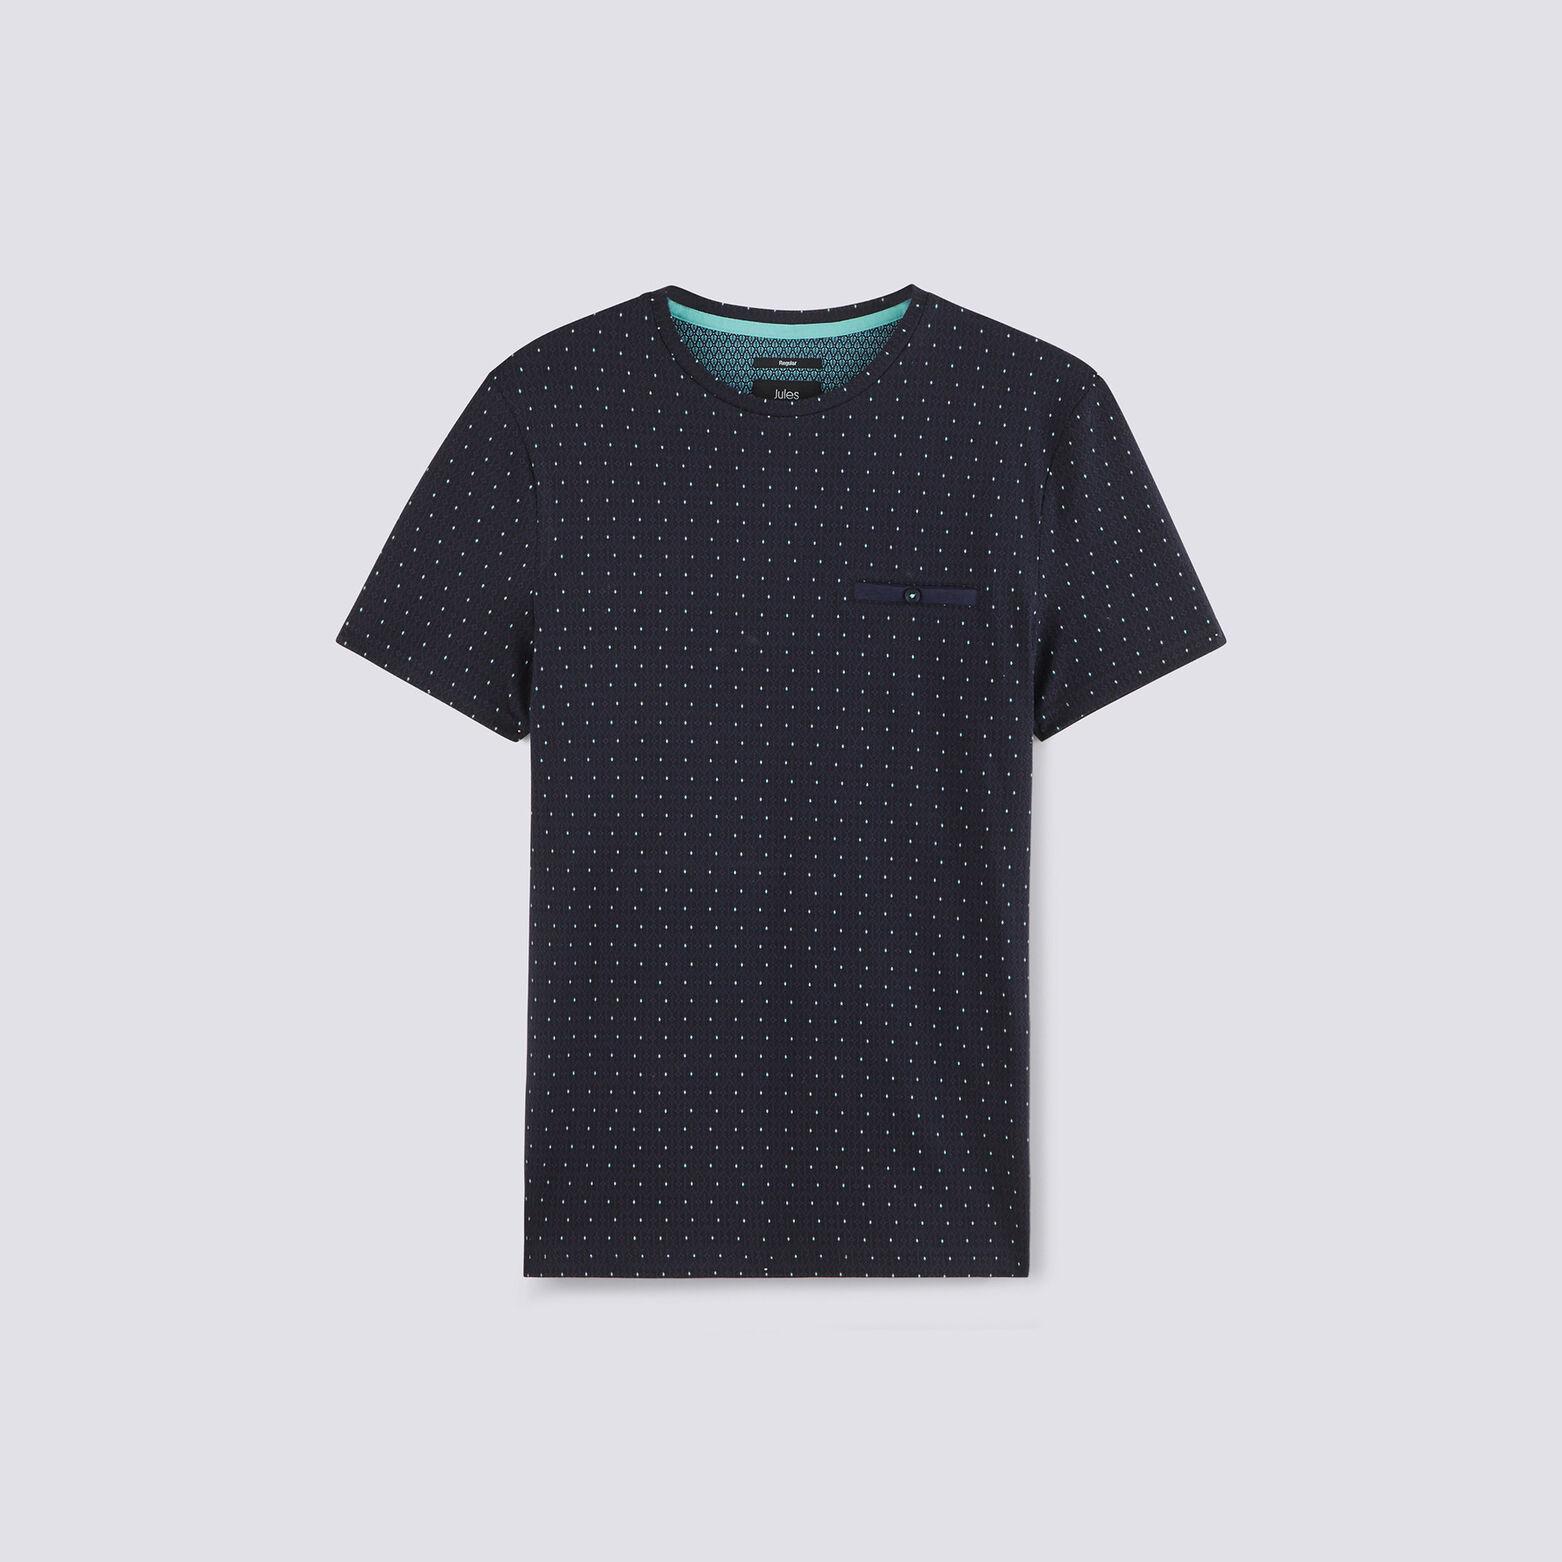 Tee shirt col rond motif graphique